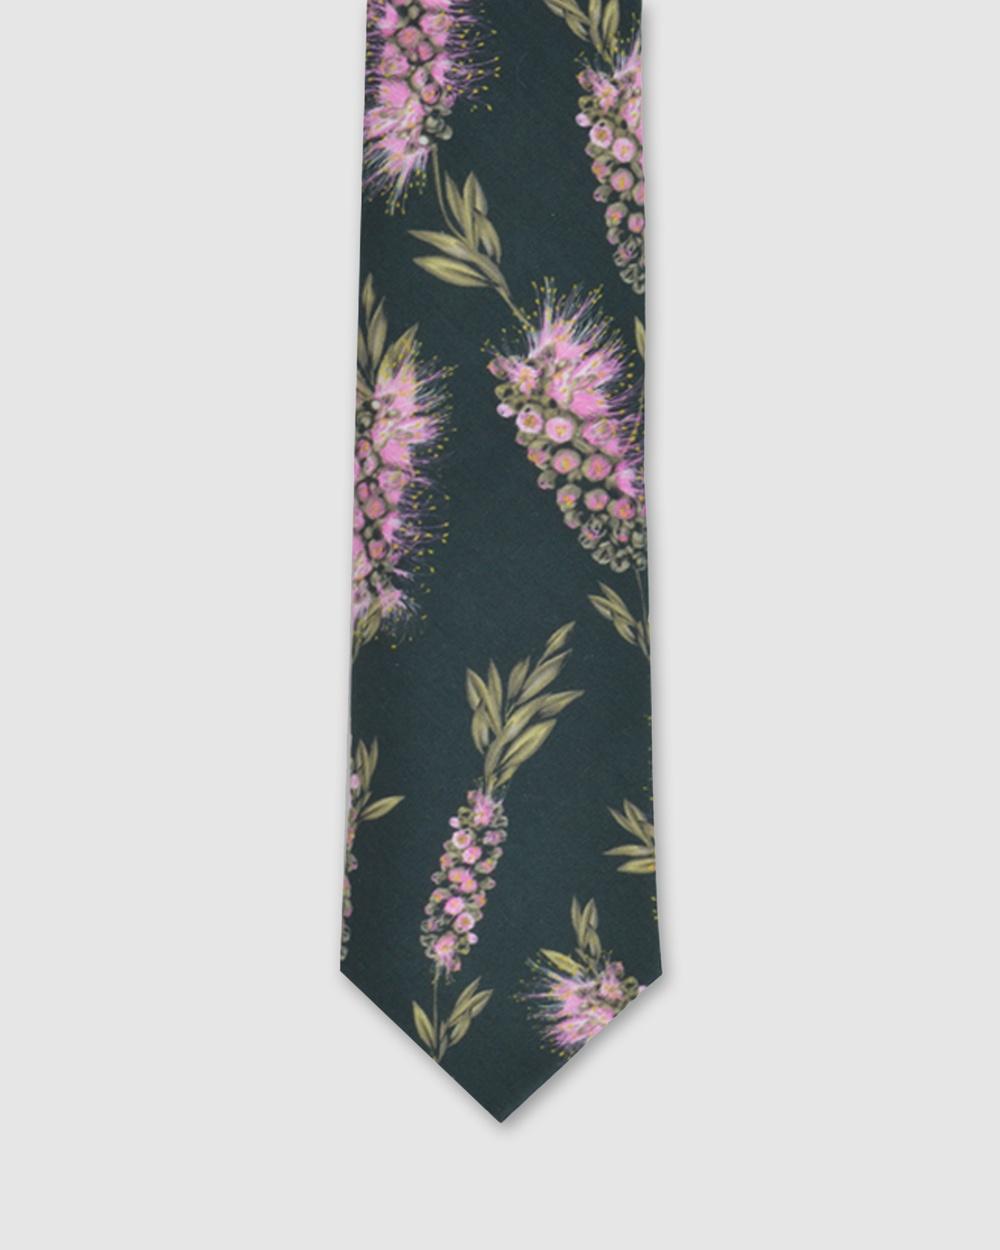 Peggy and Finn Bottlebrush Tie Ties Green